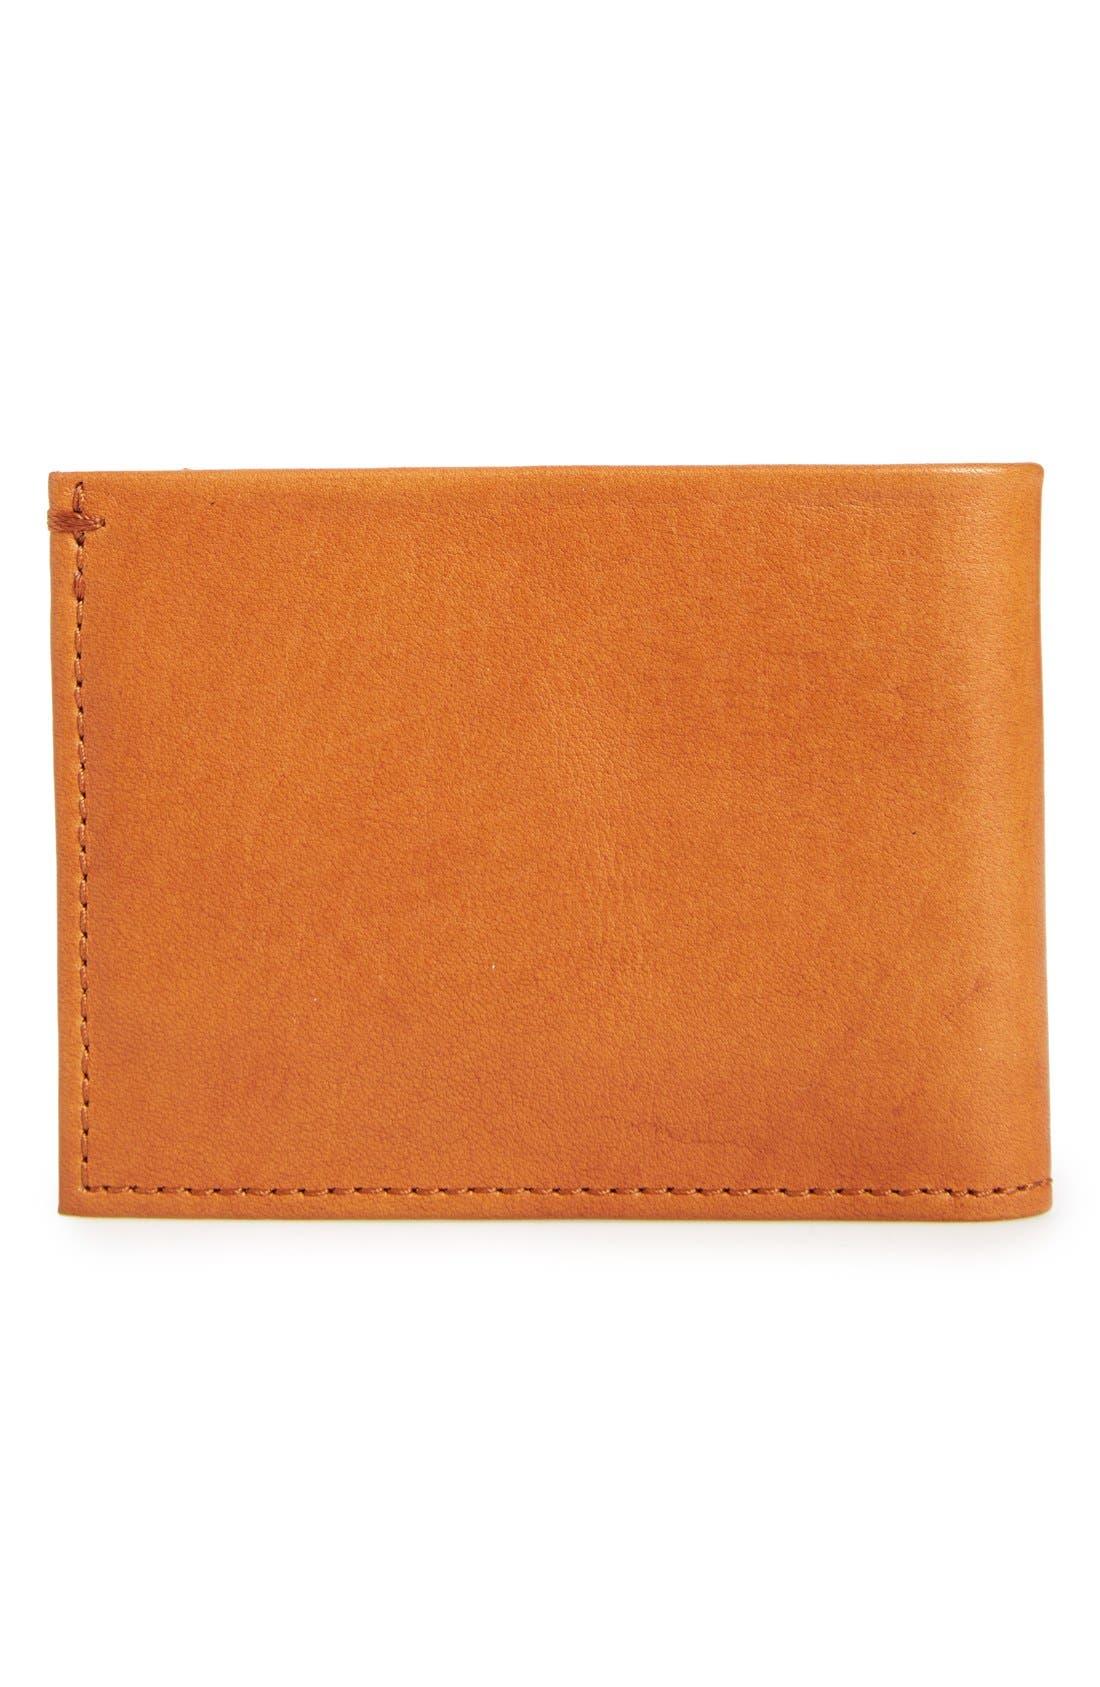 Slim Bifold Leather Wallet,                             Alternate thumbnail 3, color,                             Bourbon